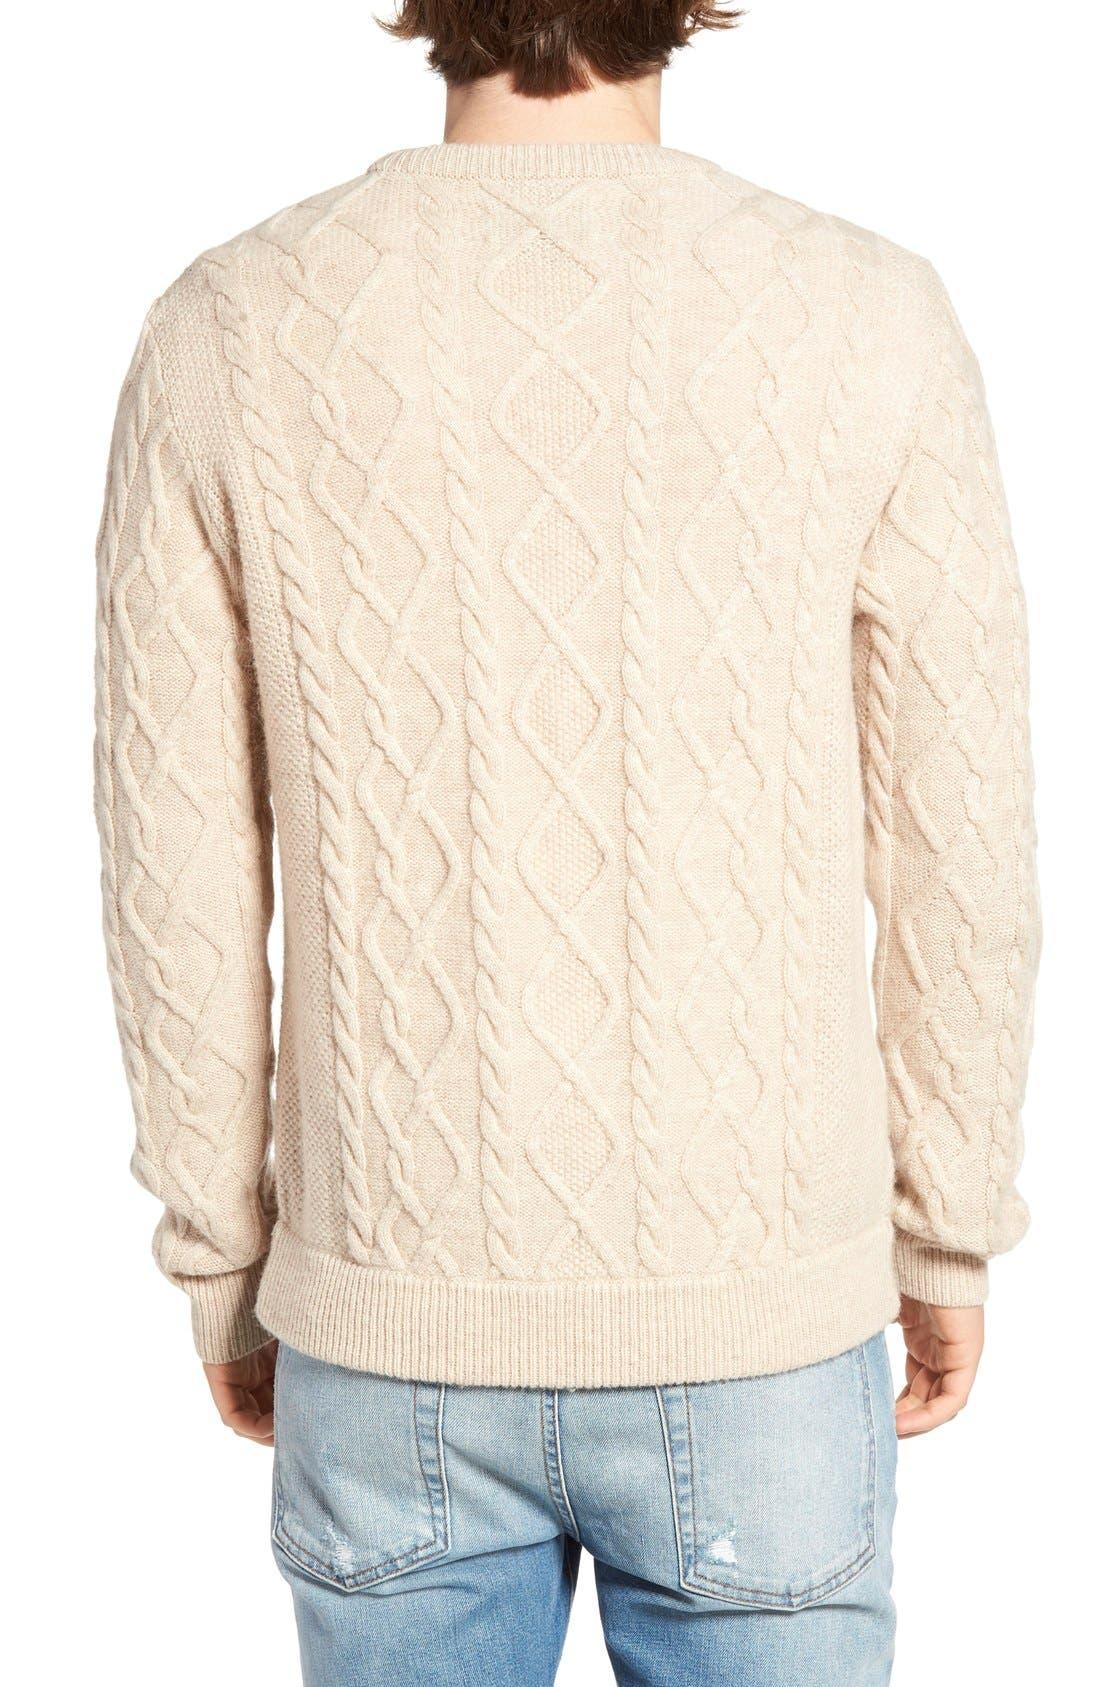 Fisherman Sweater,                             Alternate thumbnail 4, color,                             020